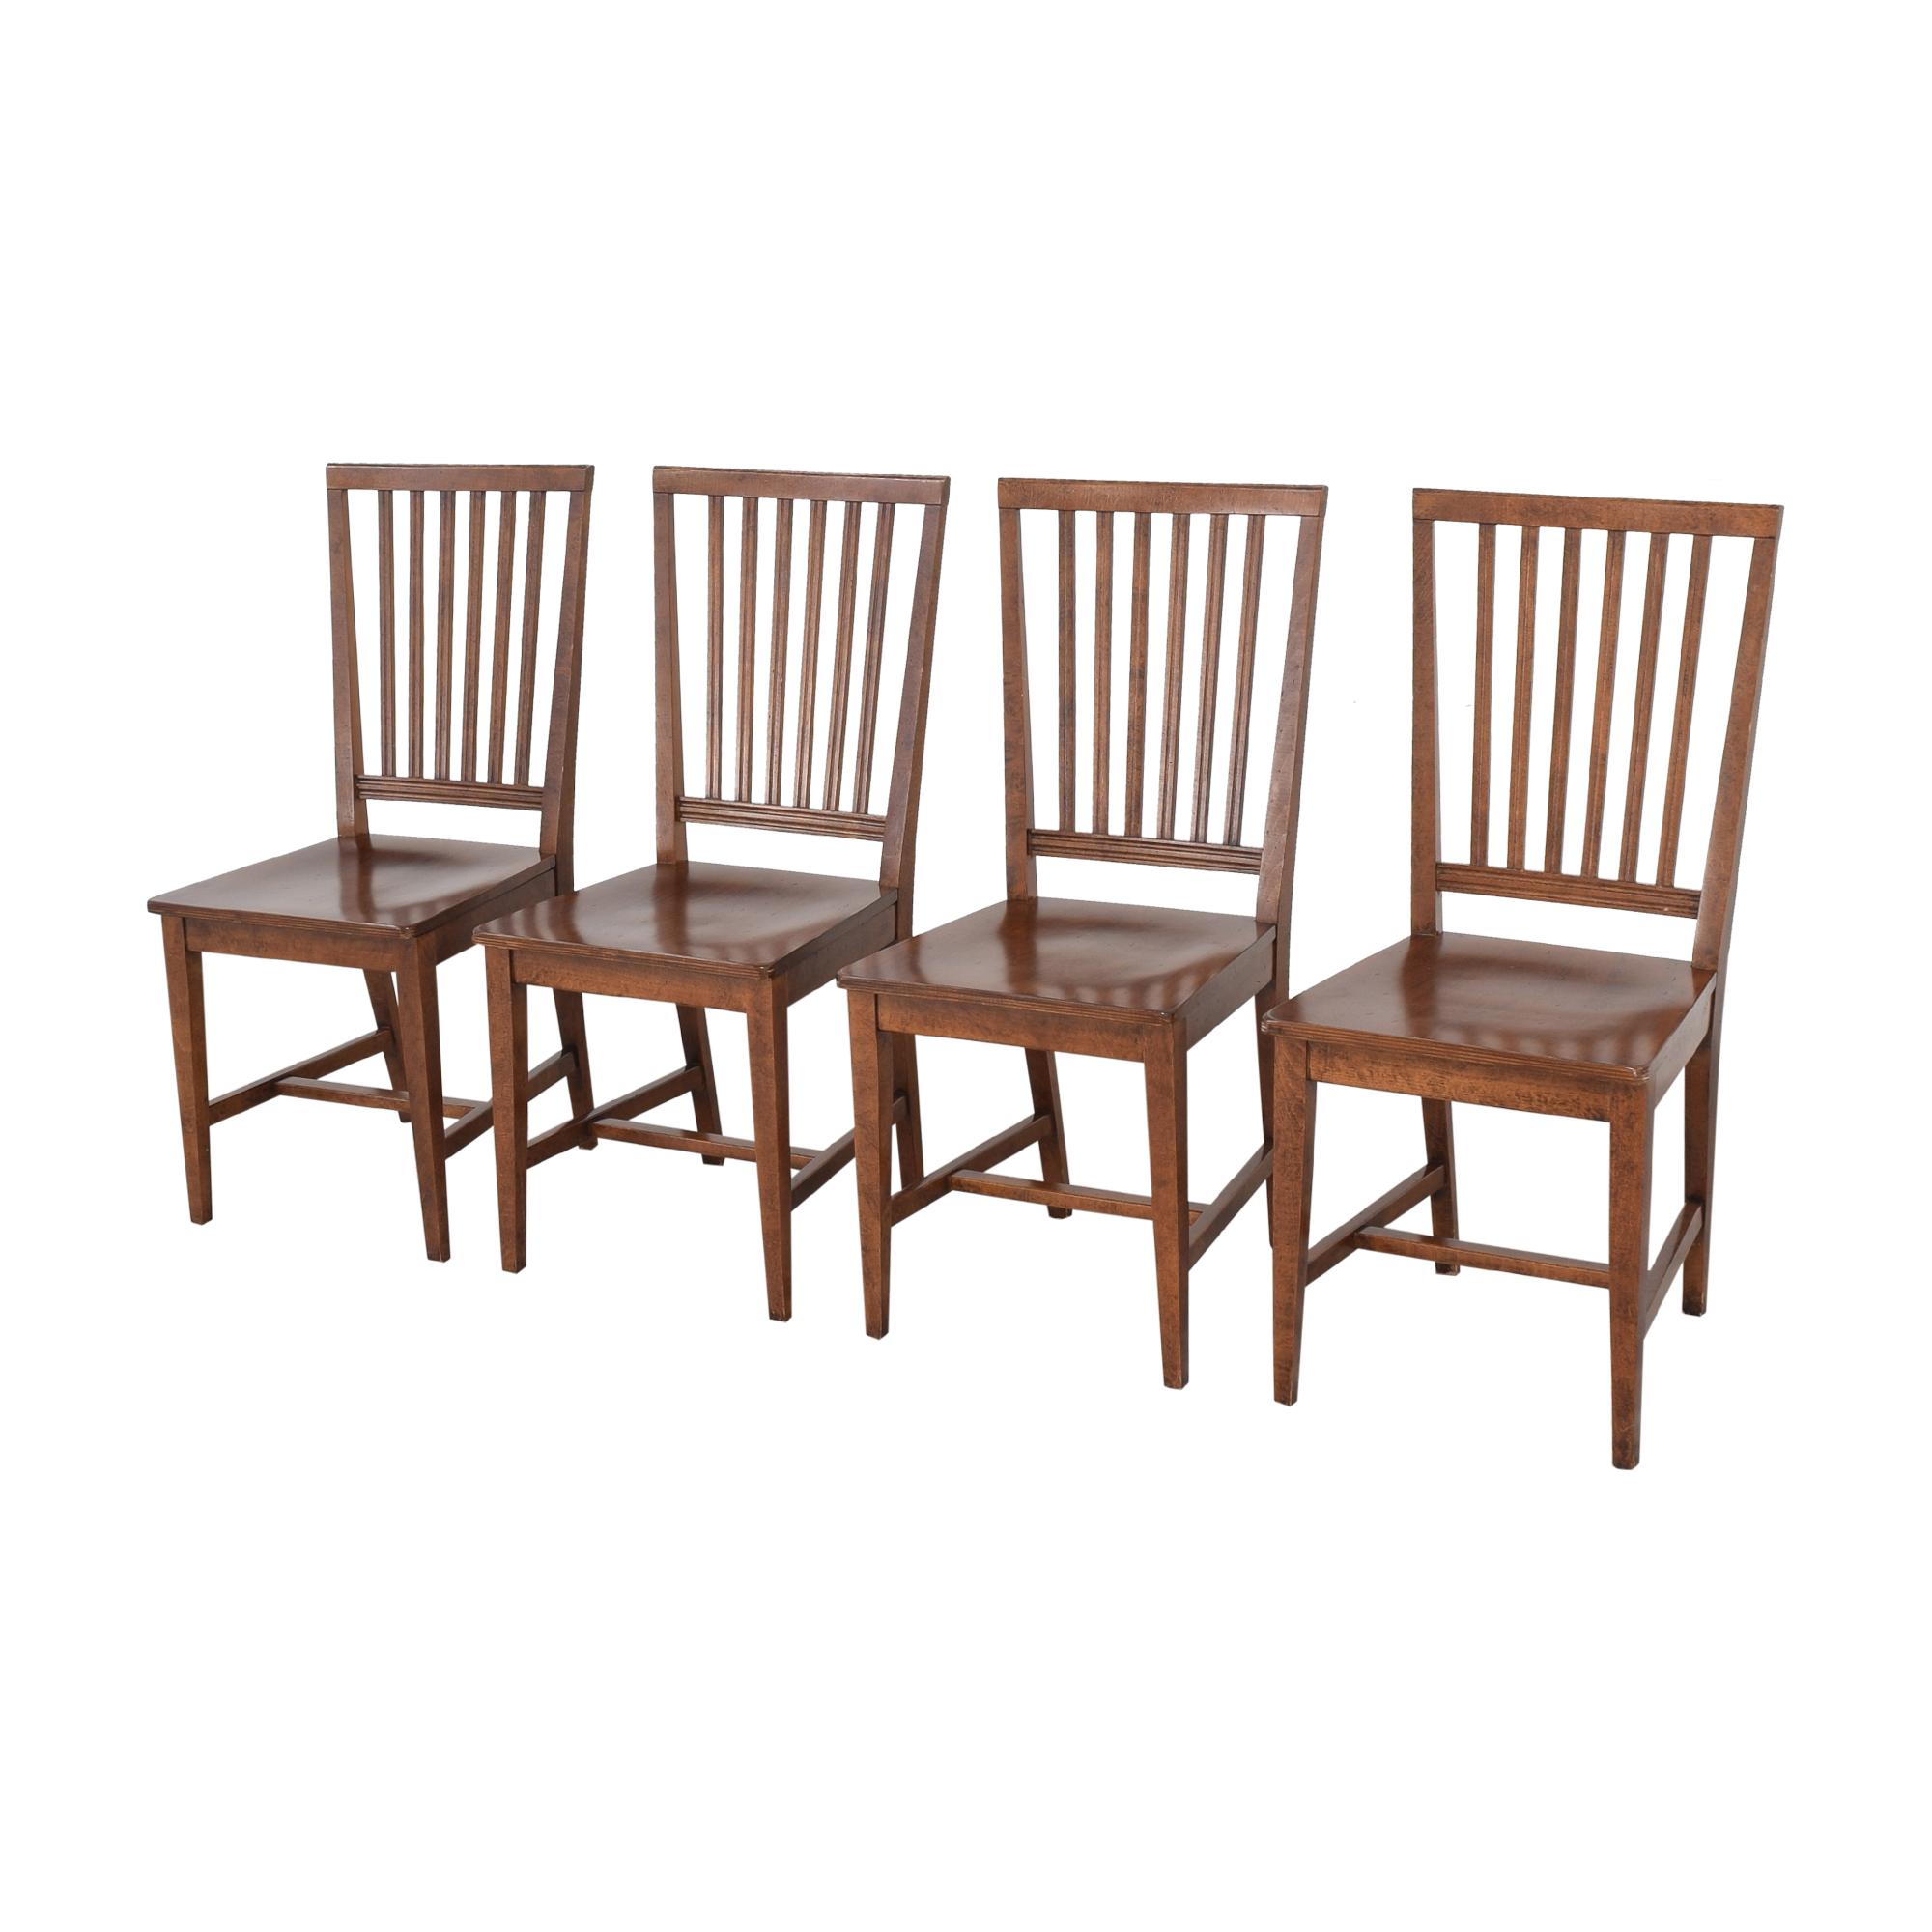 Crate & Barrel Crate & Barrel Village Nero Noche Dining Chairs discount